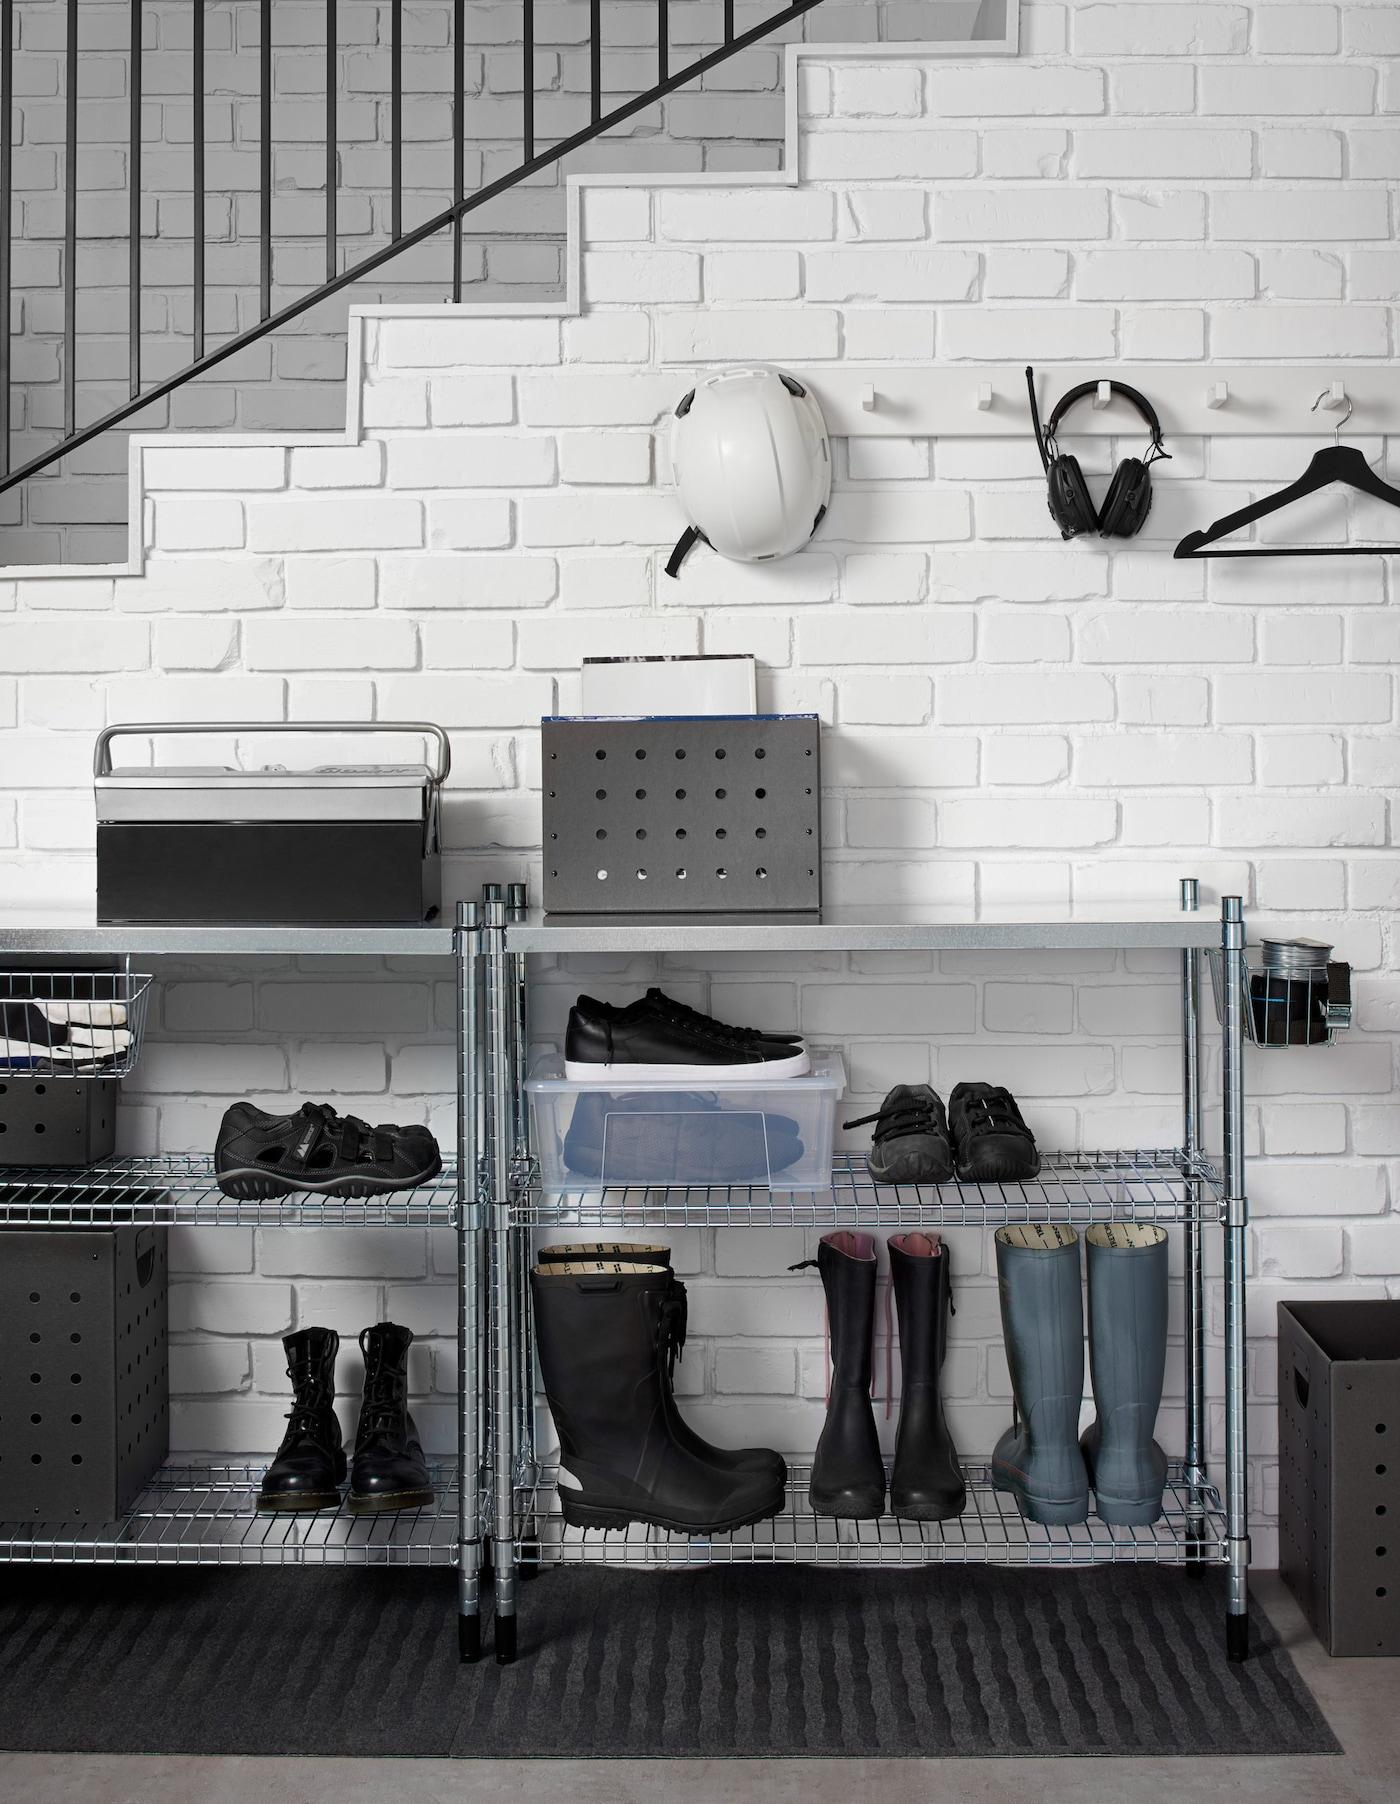 7aeab4709030 på på på skoene dine dine dine få Den entreen IKEA orden ryddige Zn6nW7